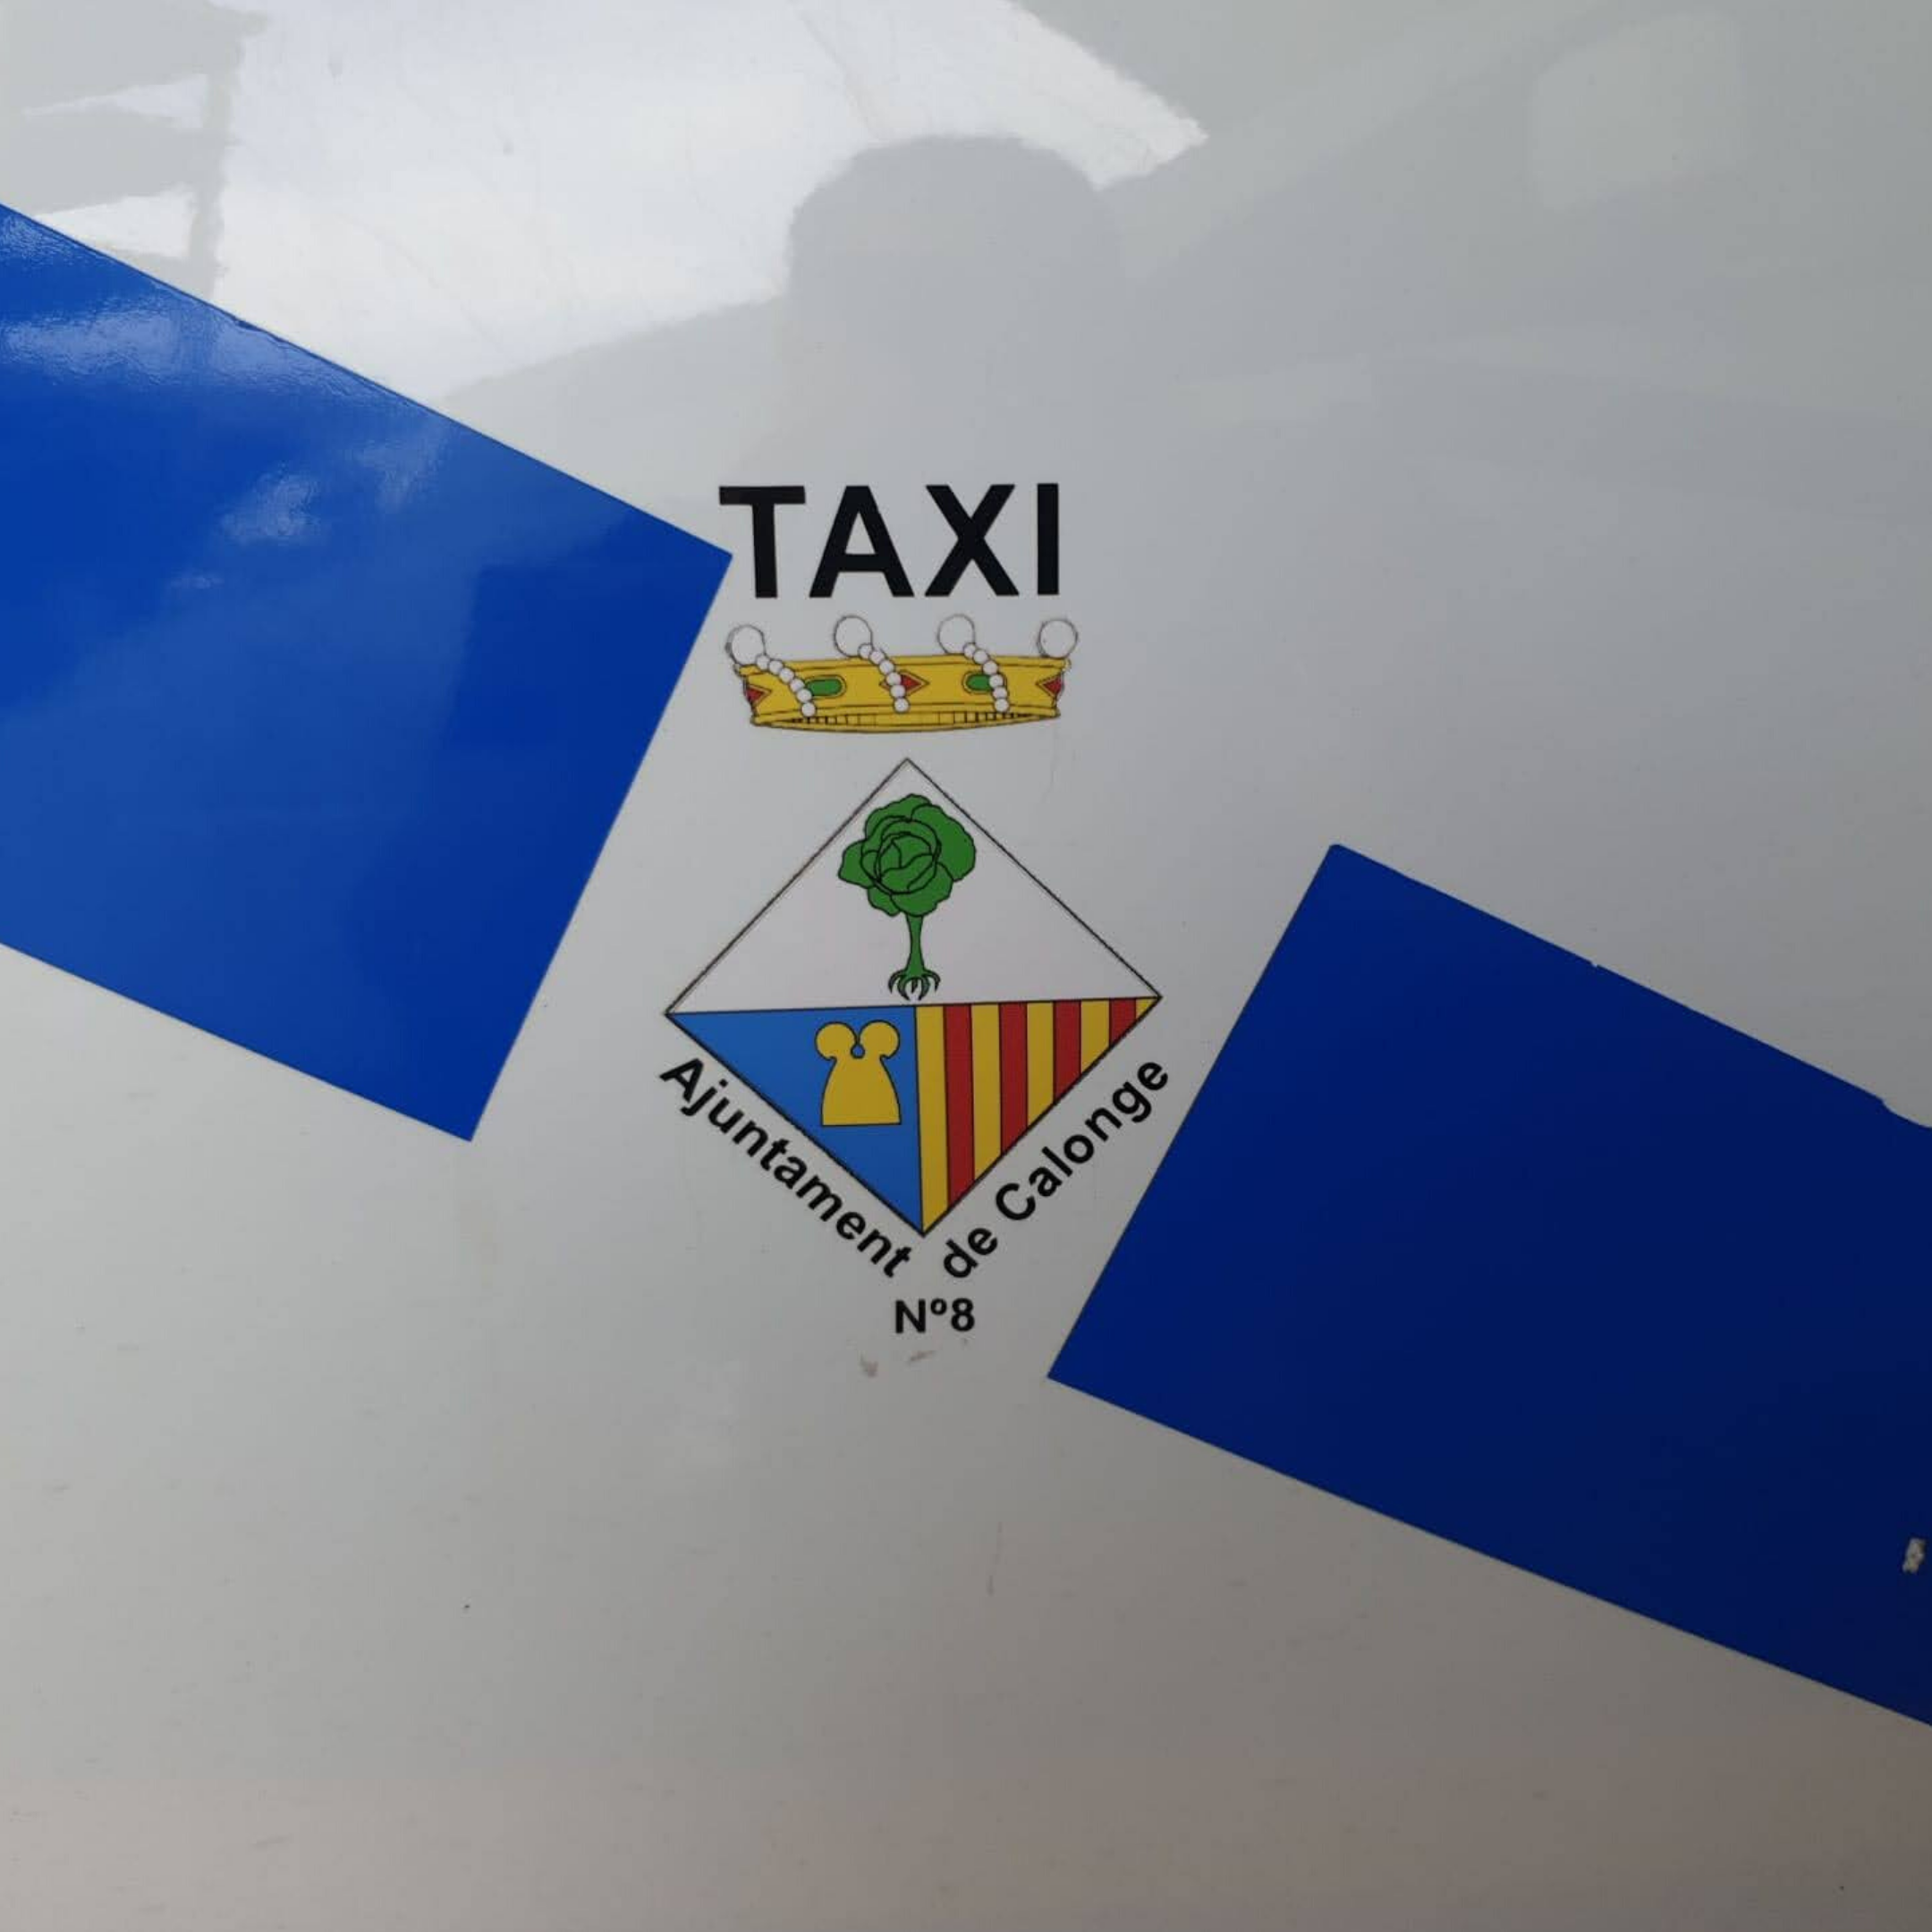 Taxi Calonge